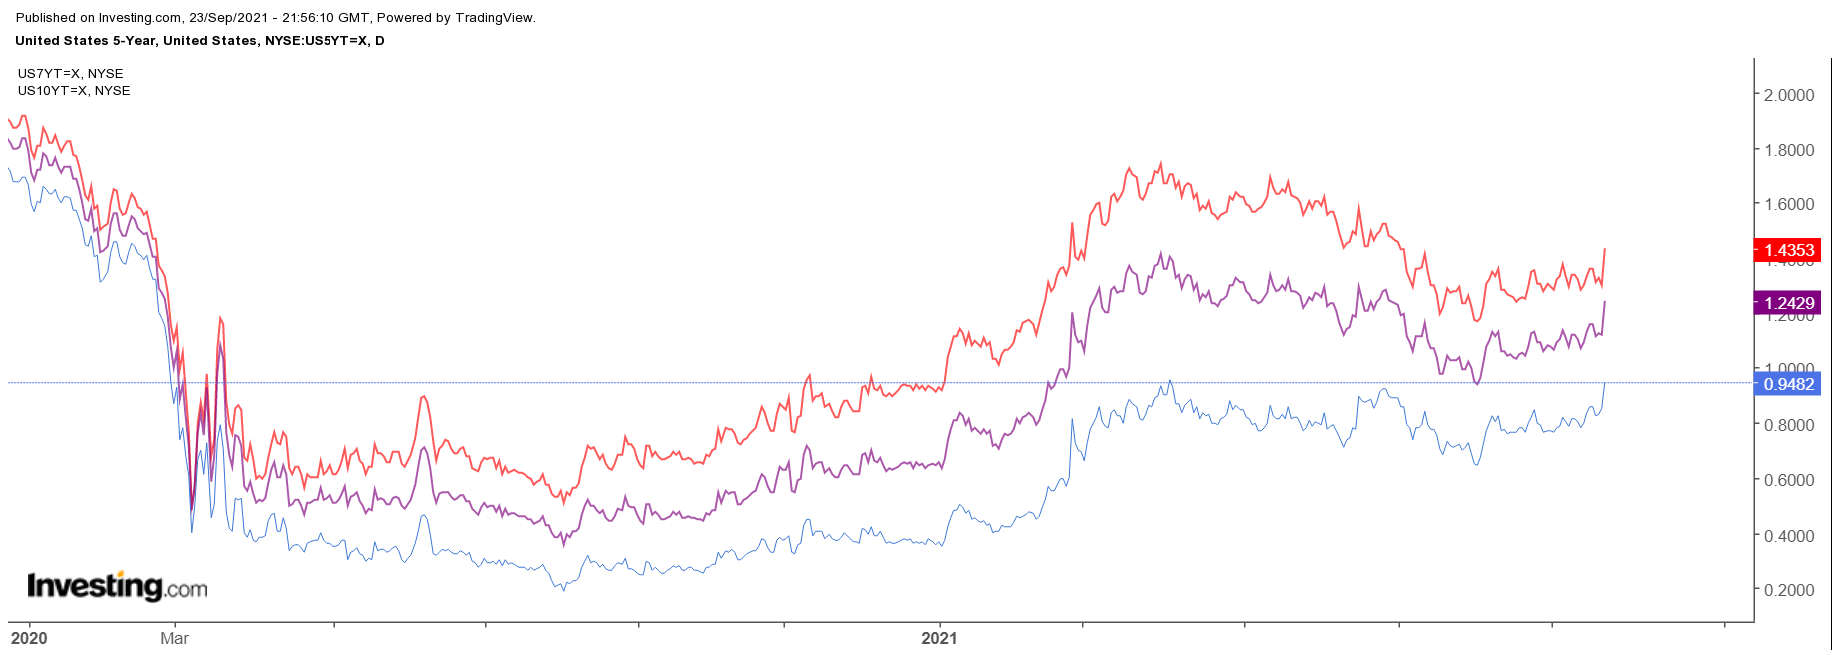 5-Year Treasuries Daily